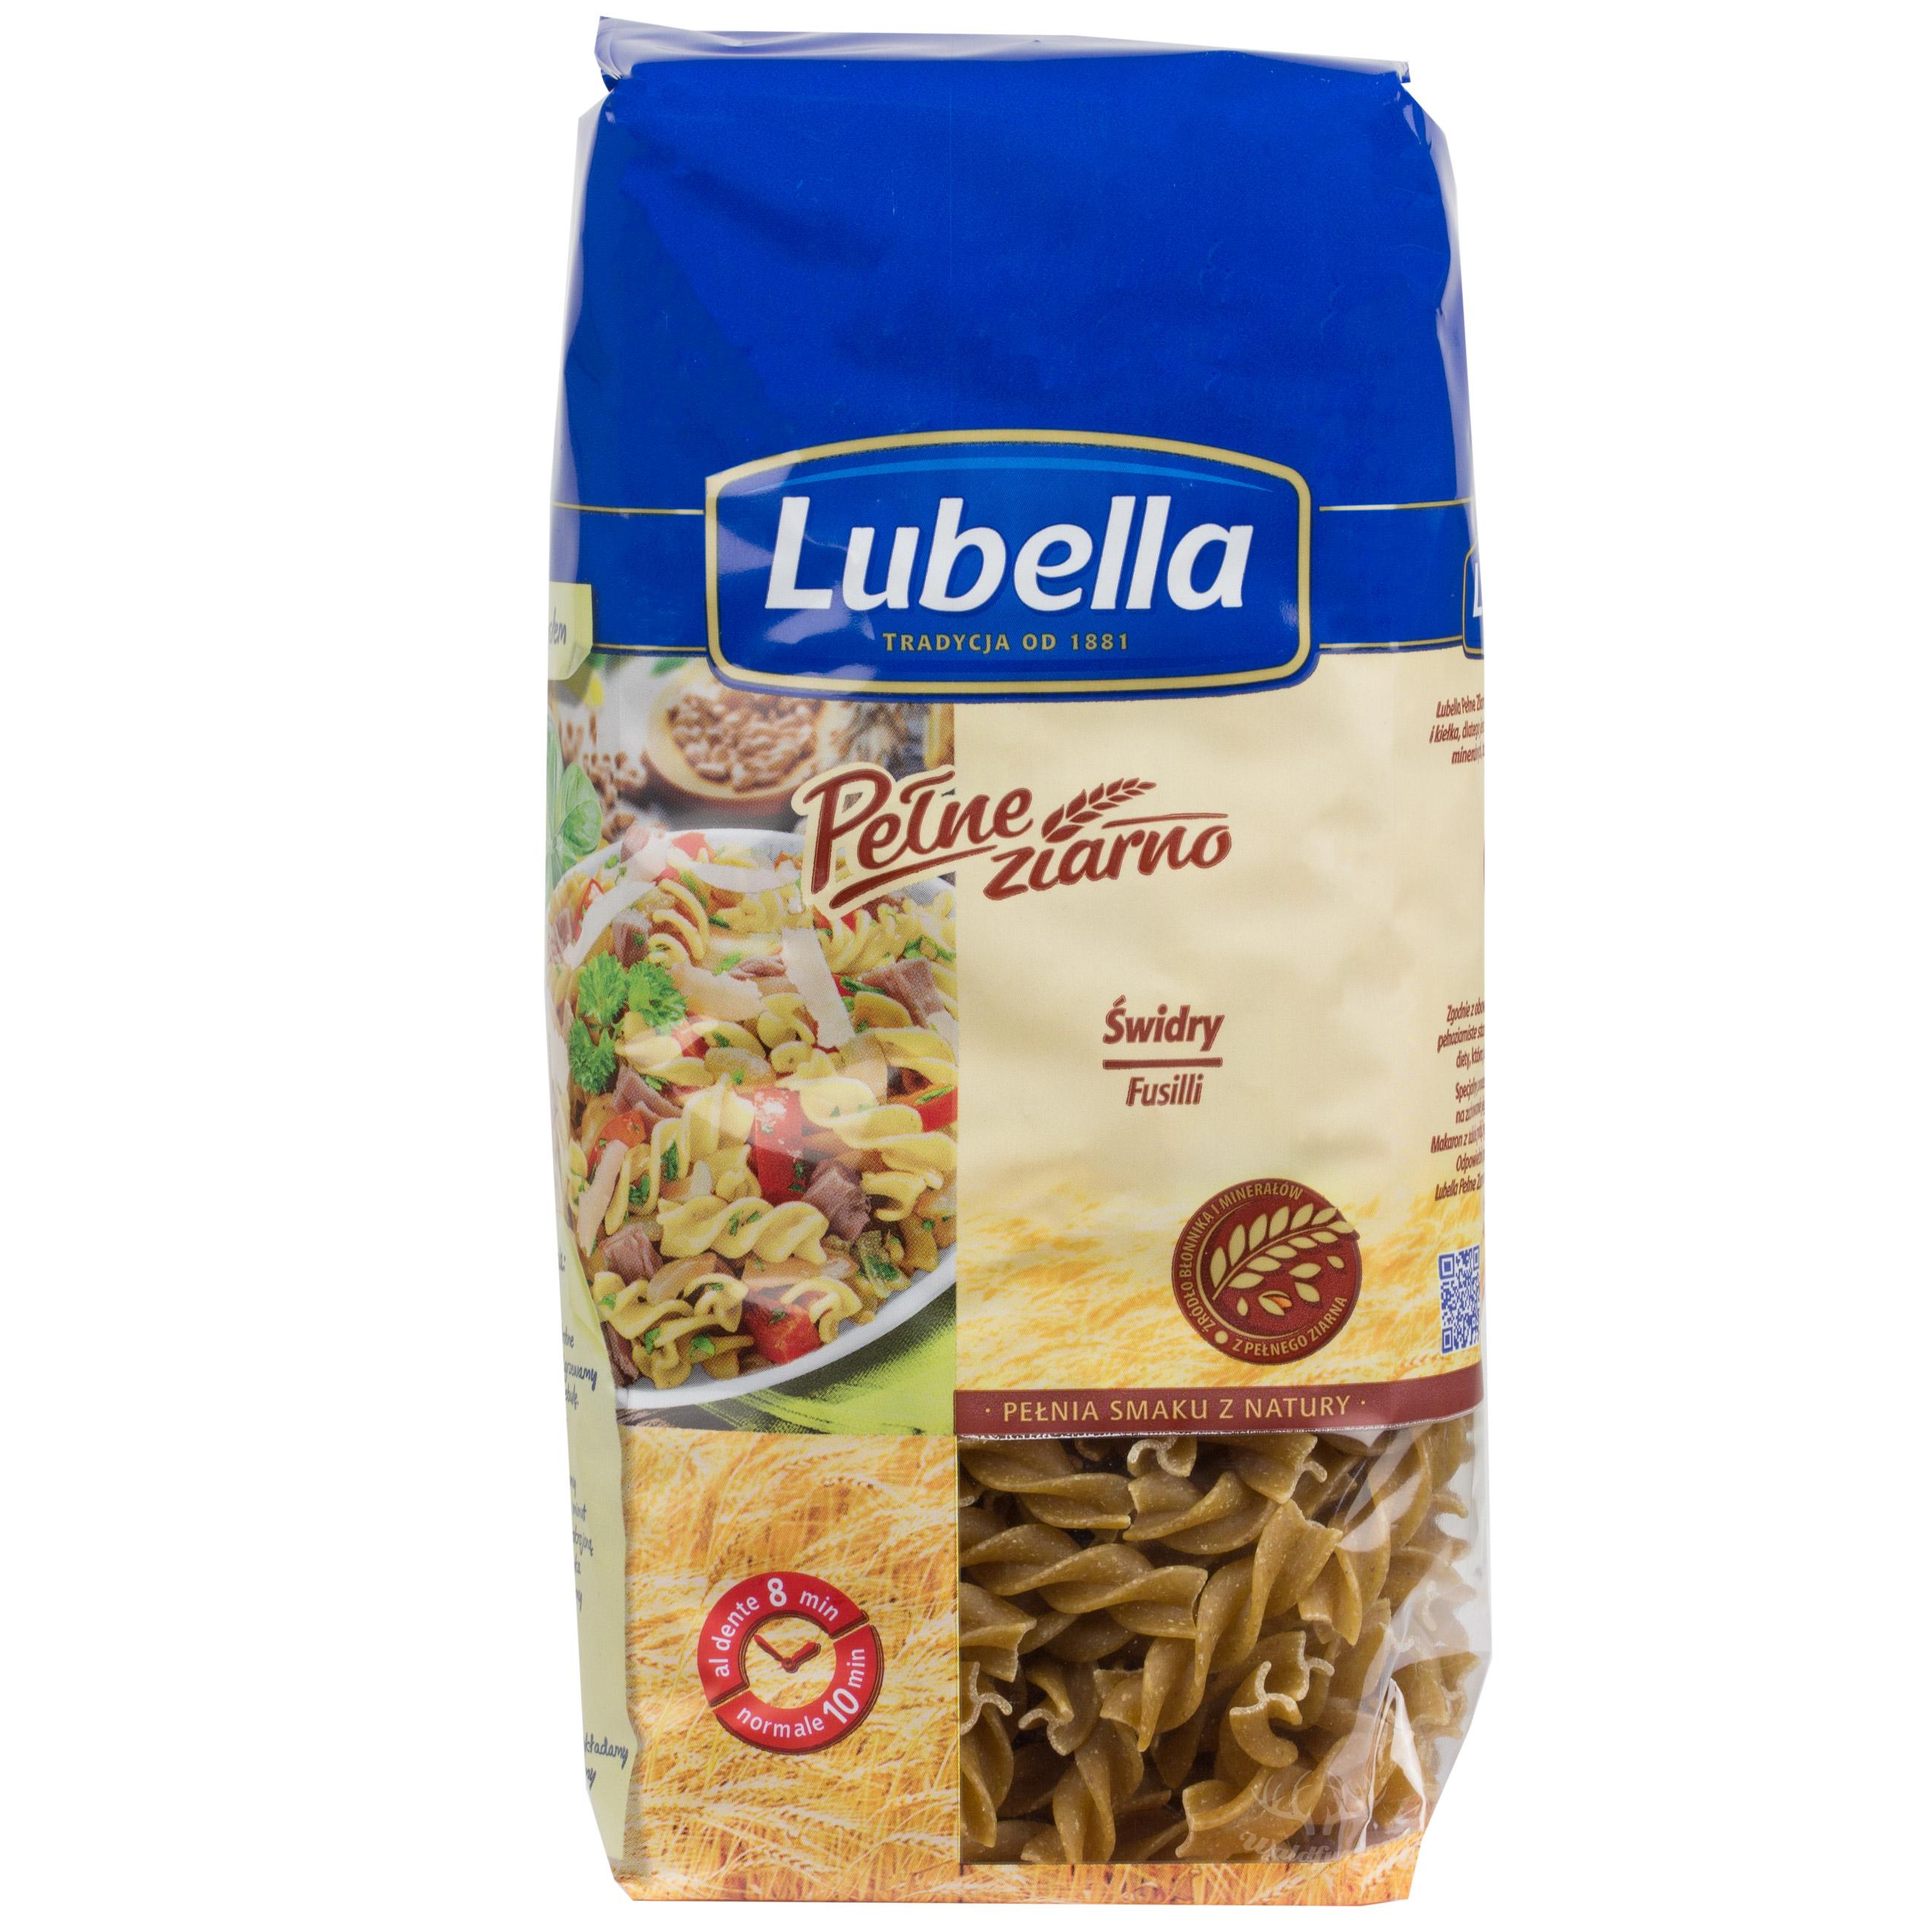 Lubella Vollkornnudeln -Fusilli 400g